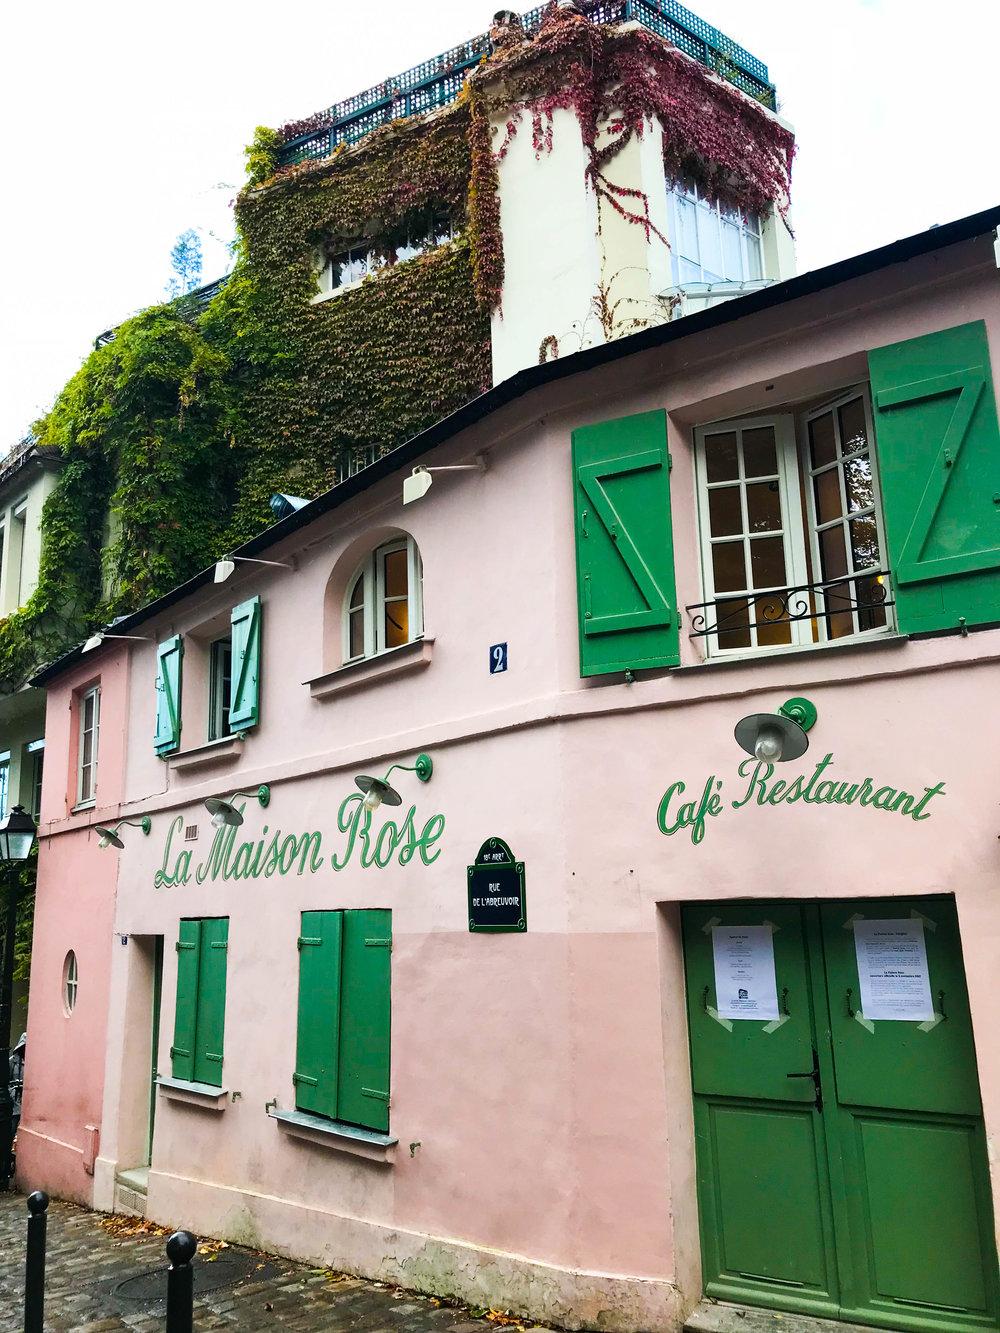 La Maison Rose Cafe